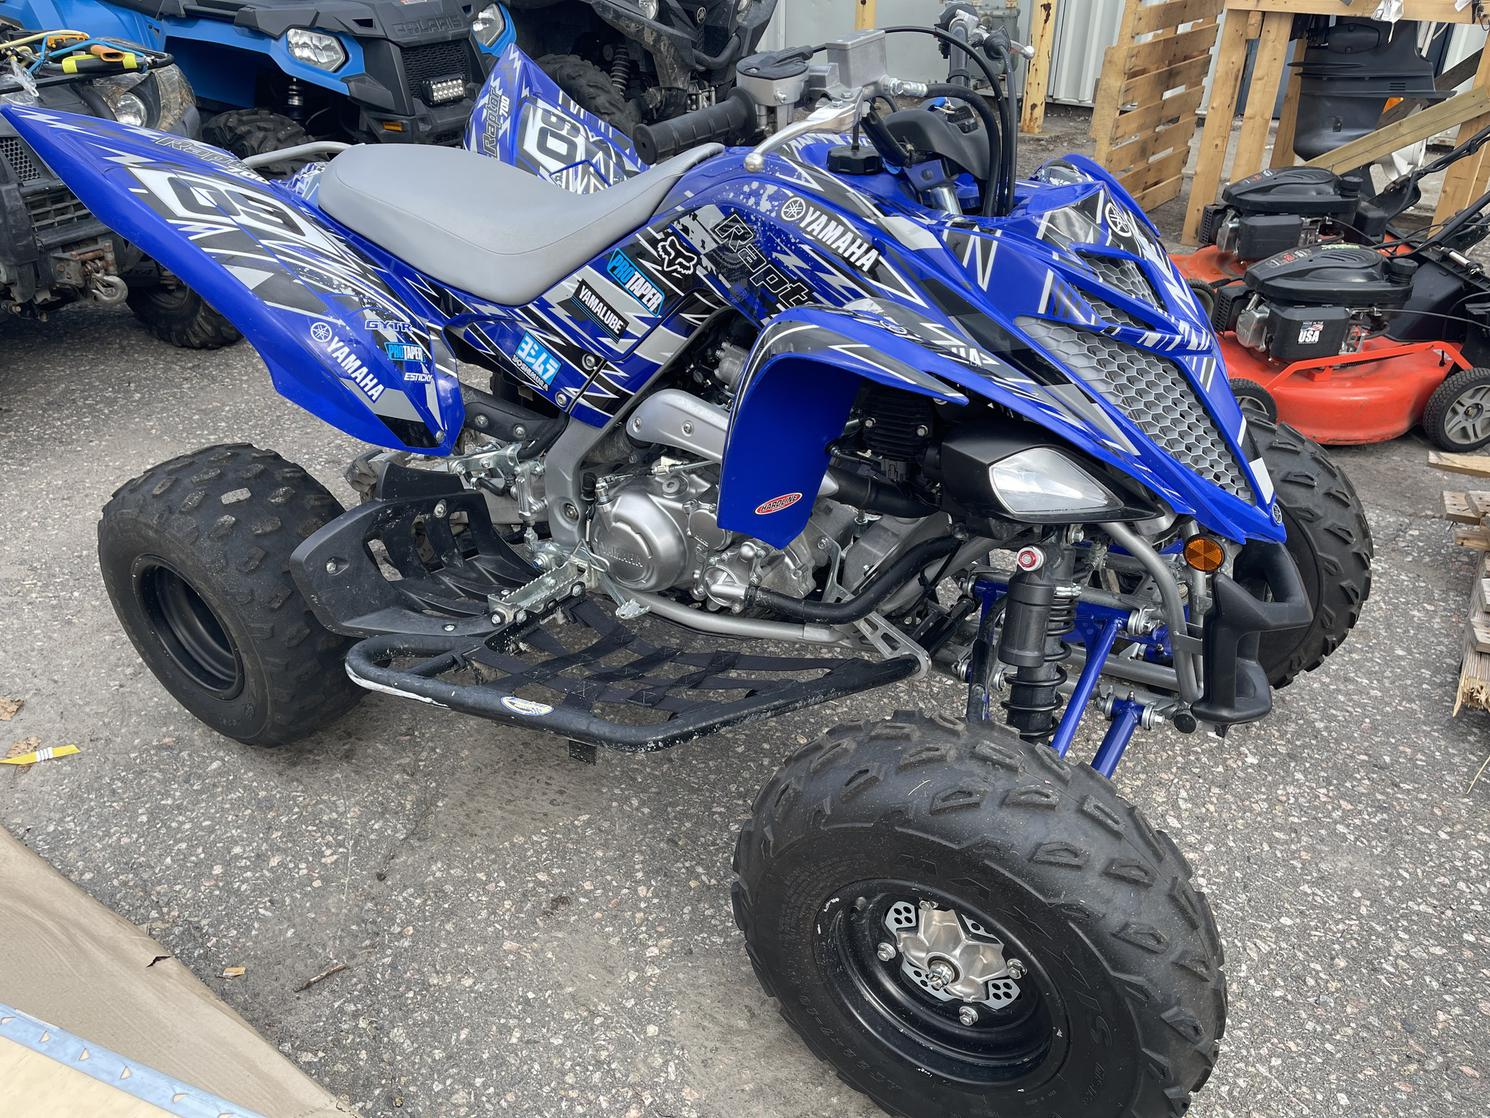 Yamaha Raptor 700 R - YF70RXLL 2020